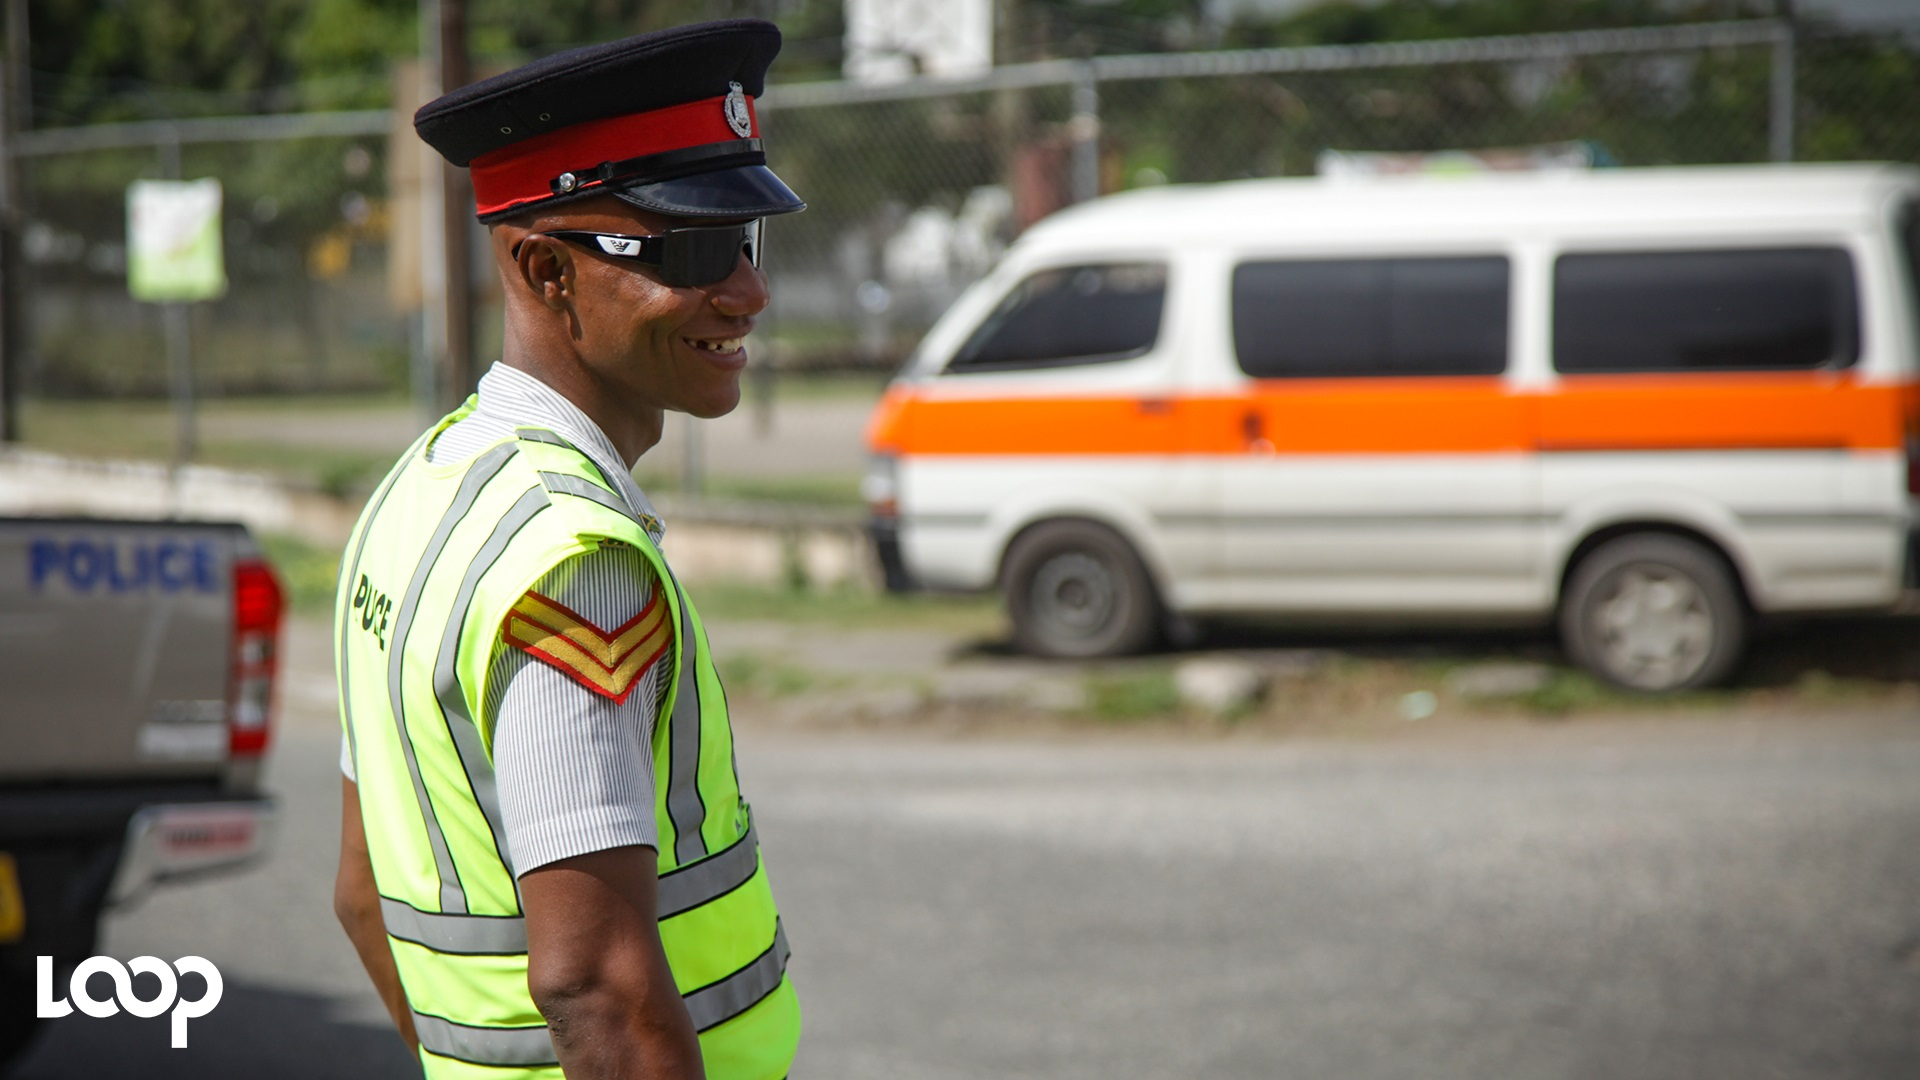 File photo of a traffic cop. (PHOTO: Shawn Barnes)